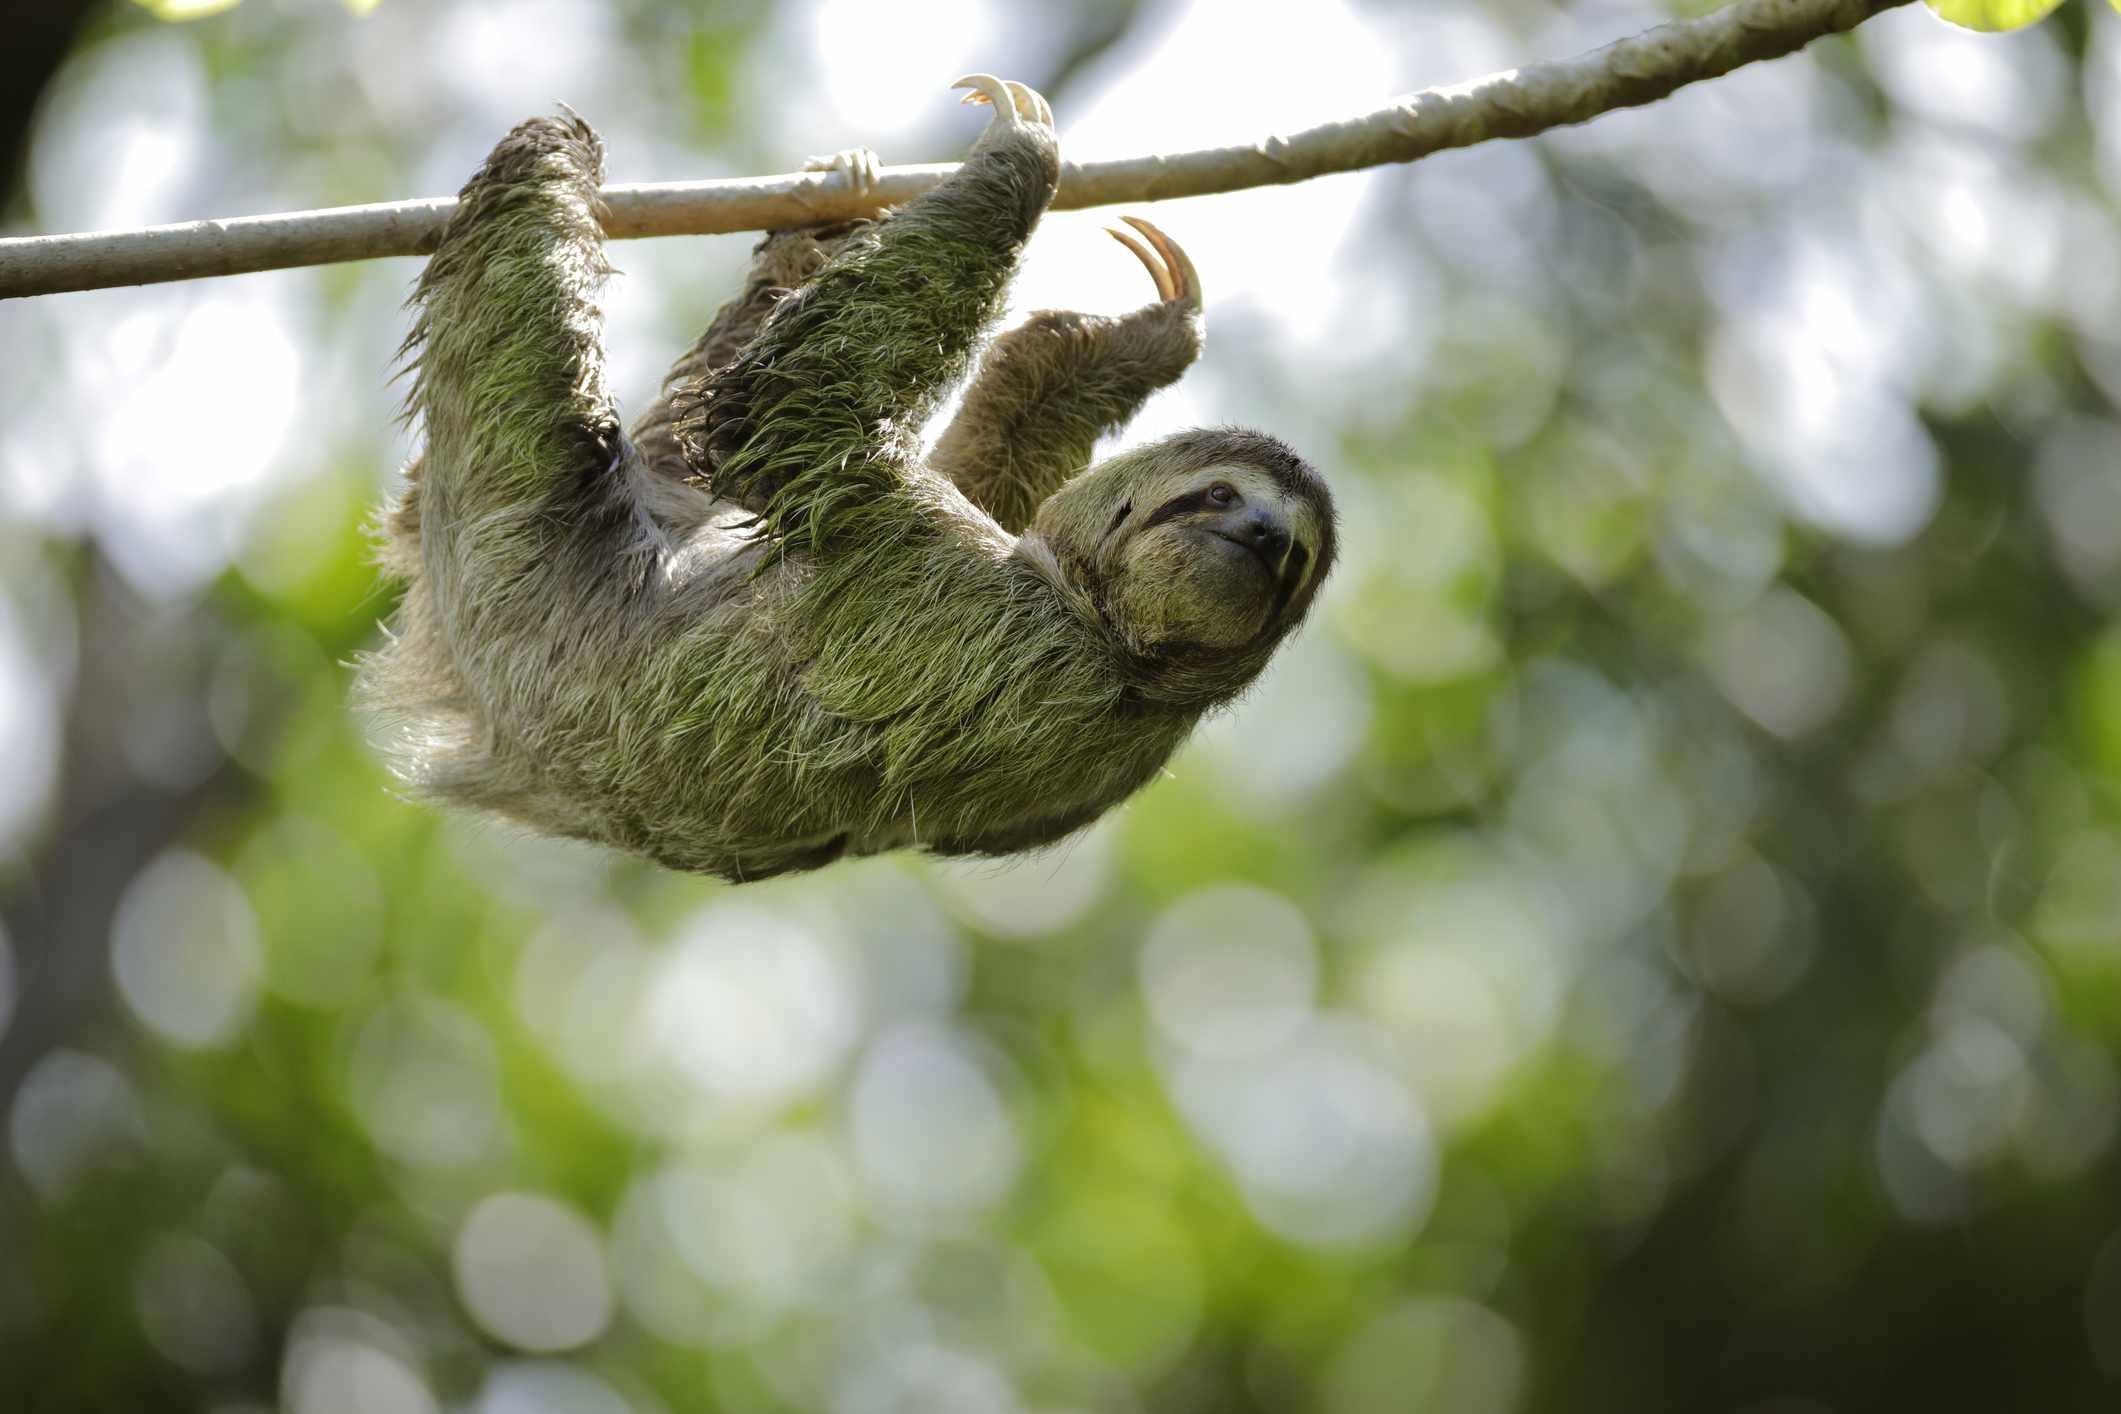 sloth walking on tree branch